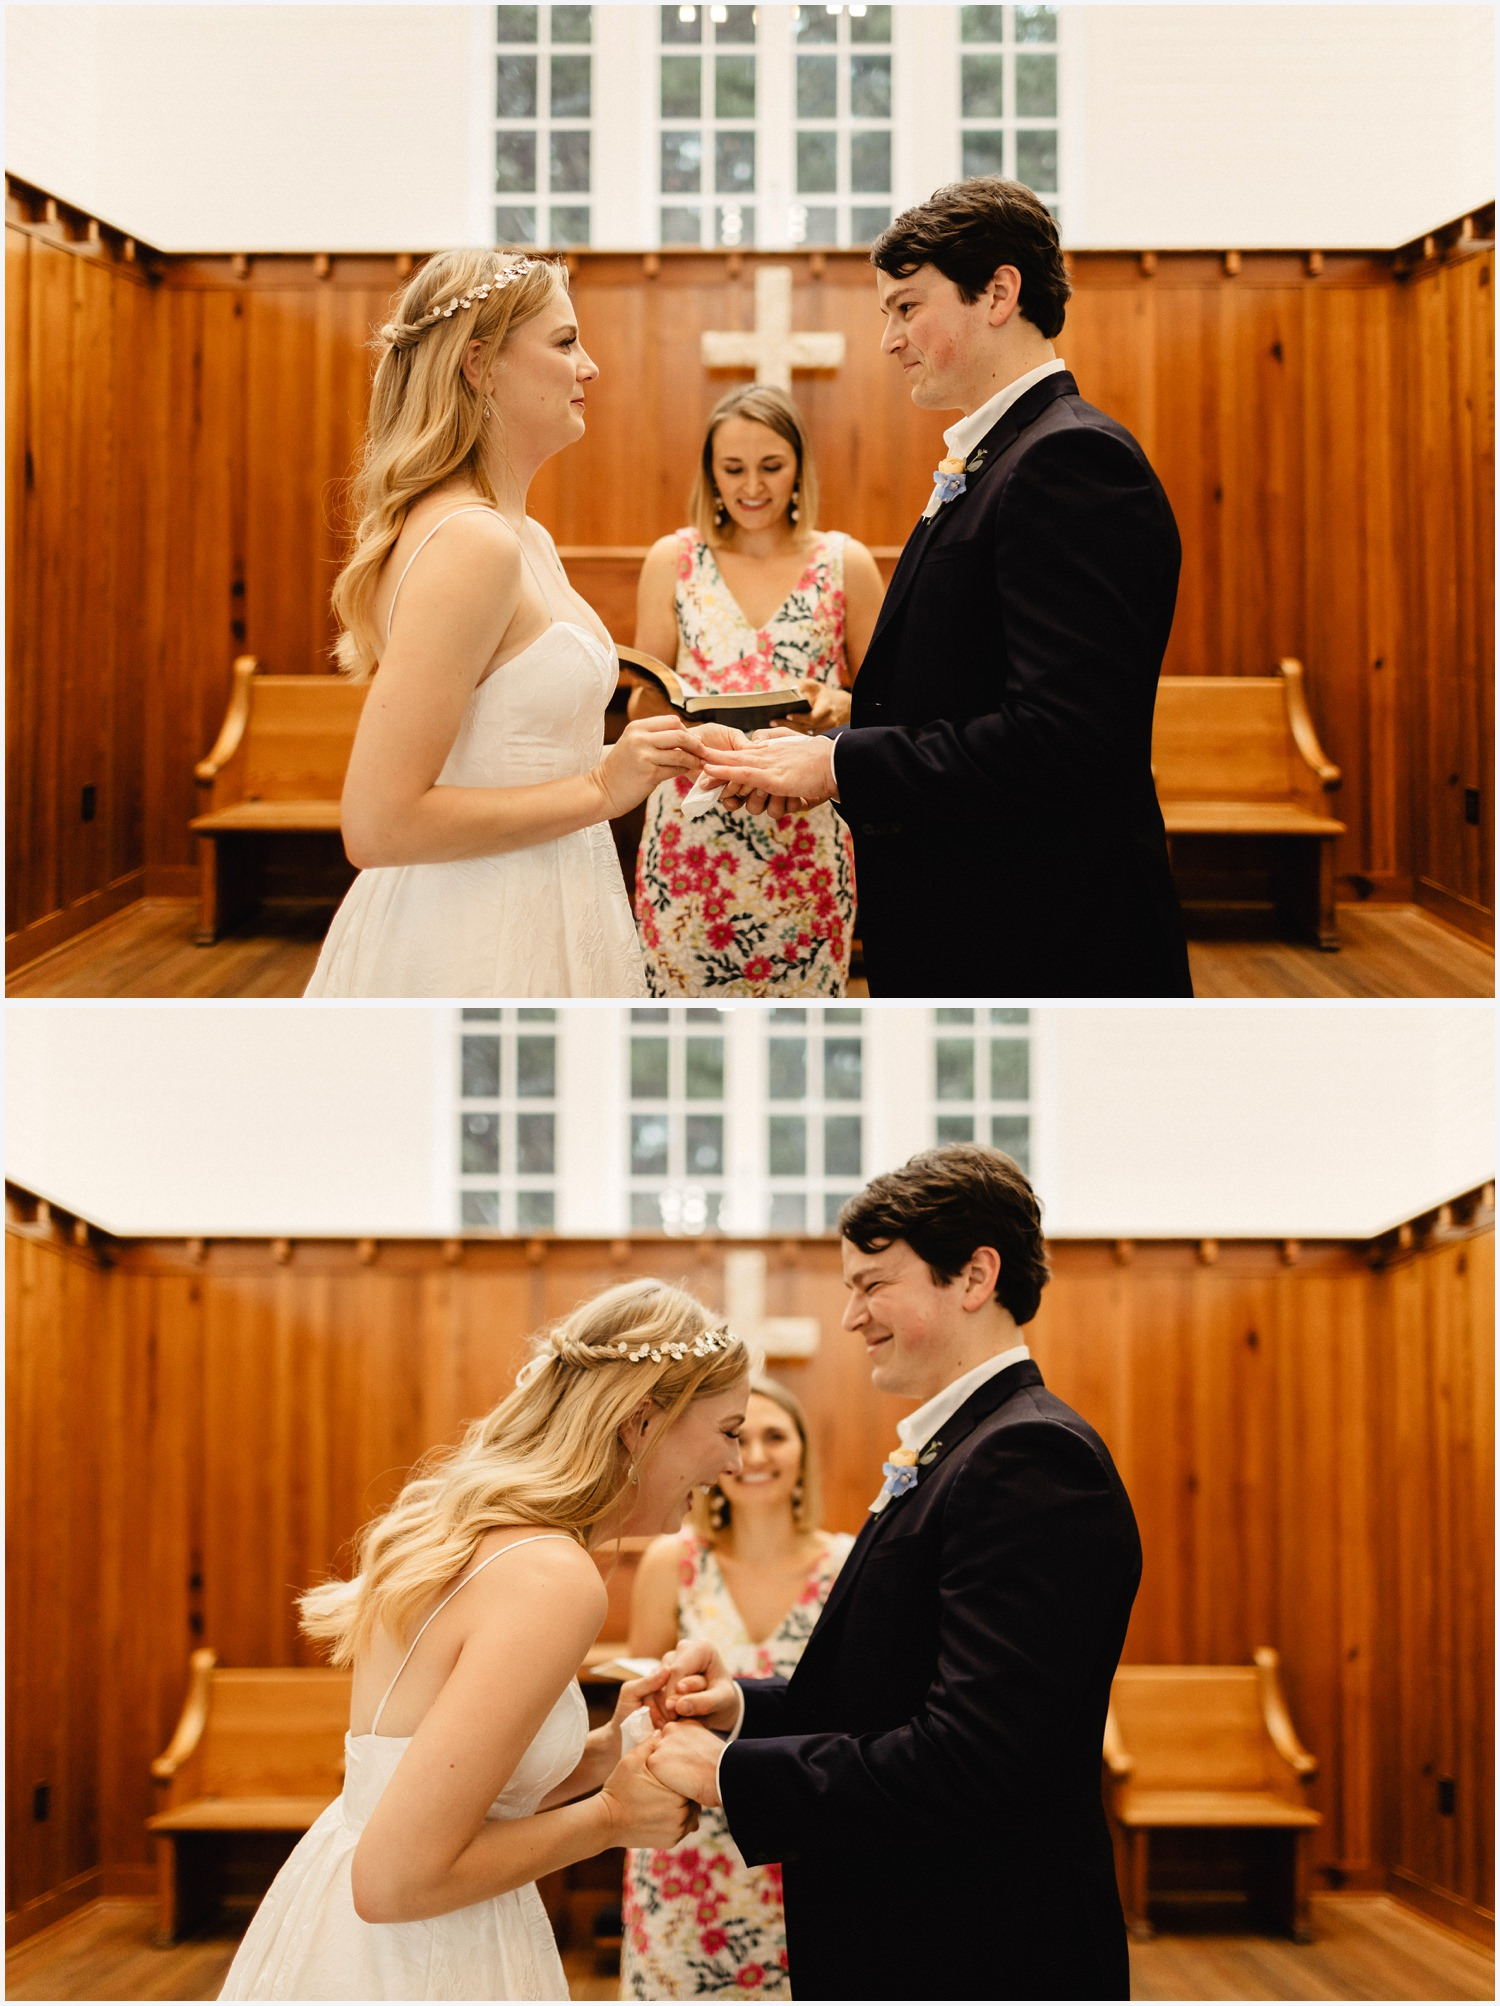 Seaside Chapel wedding ceremony